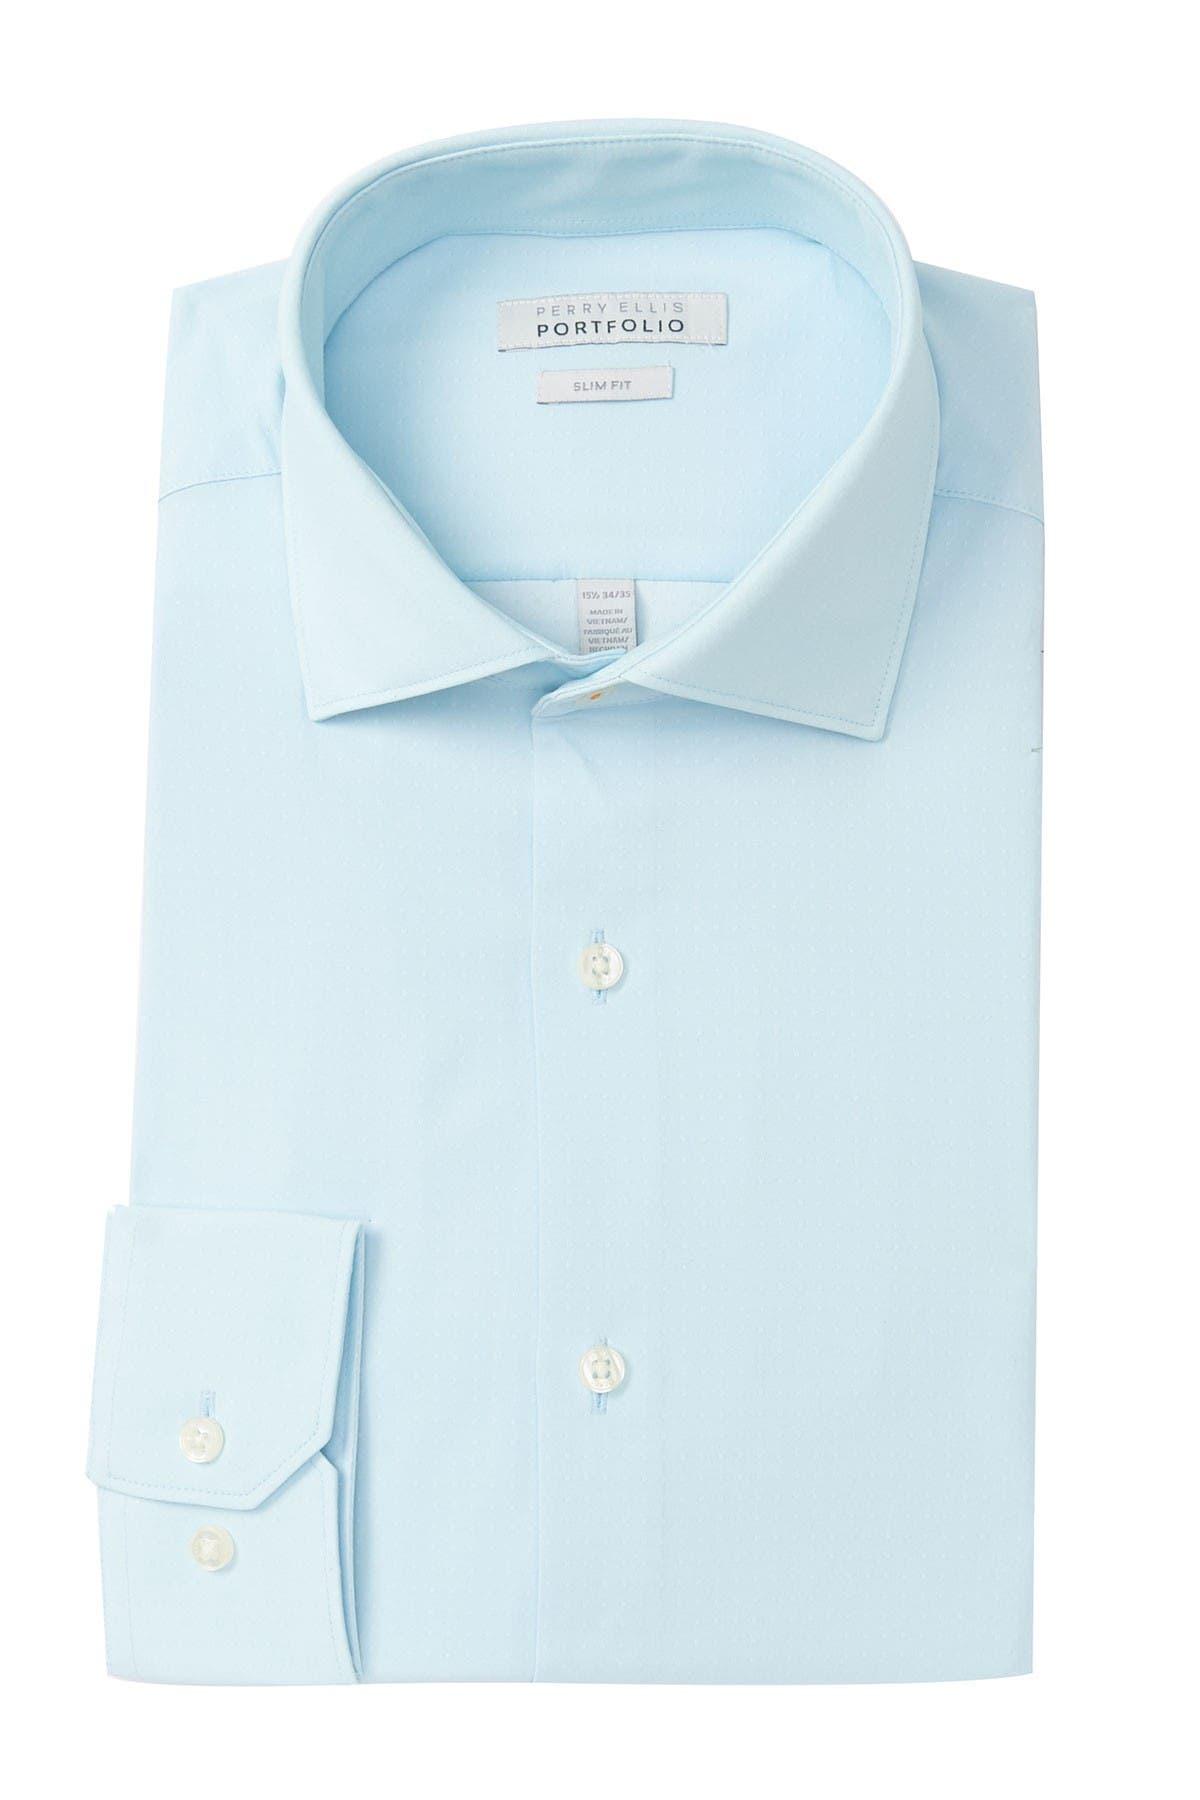 Image of Perry Ellis Slim Fit Dobby Dress Shirt